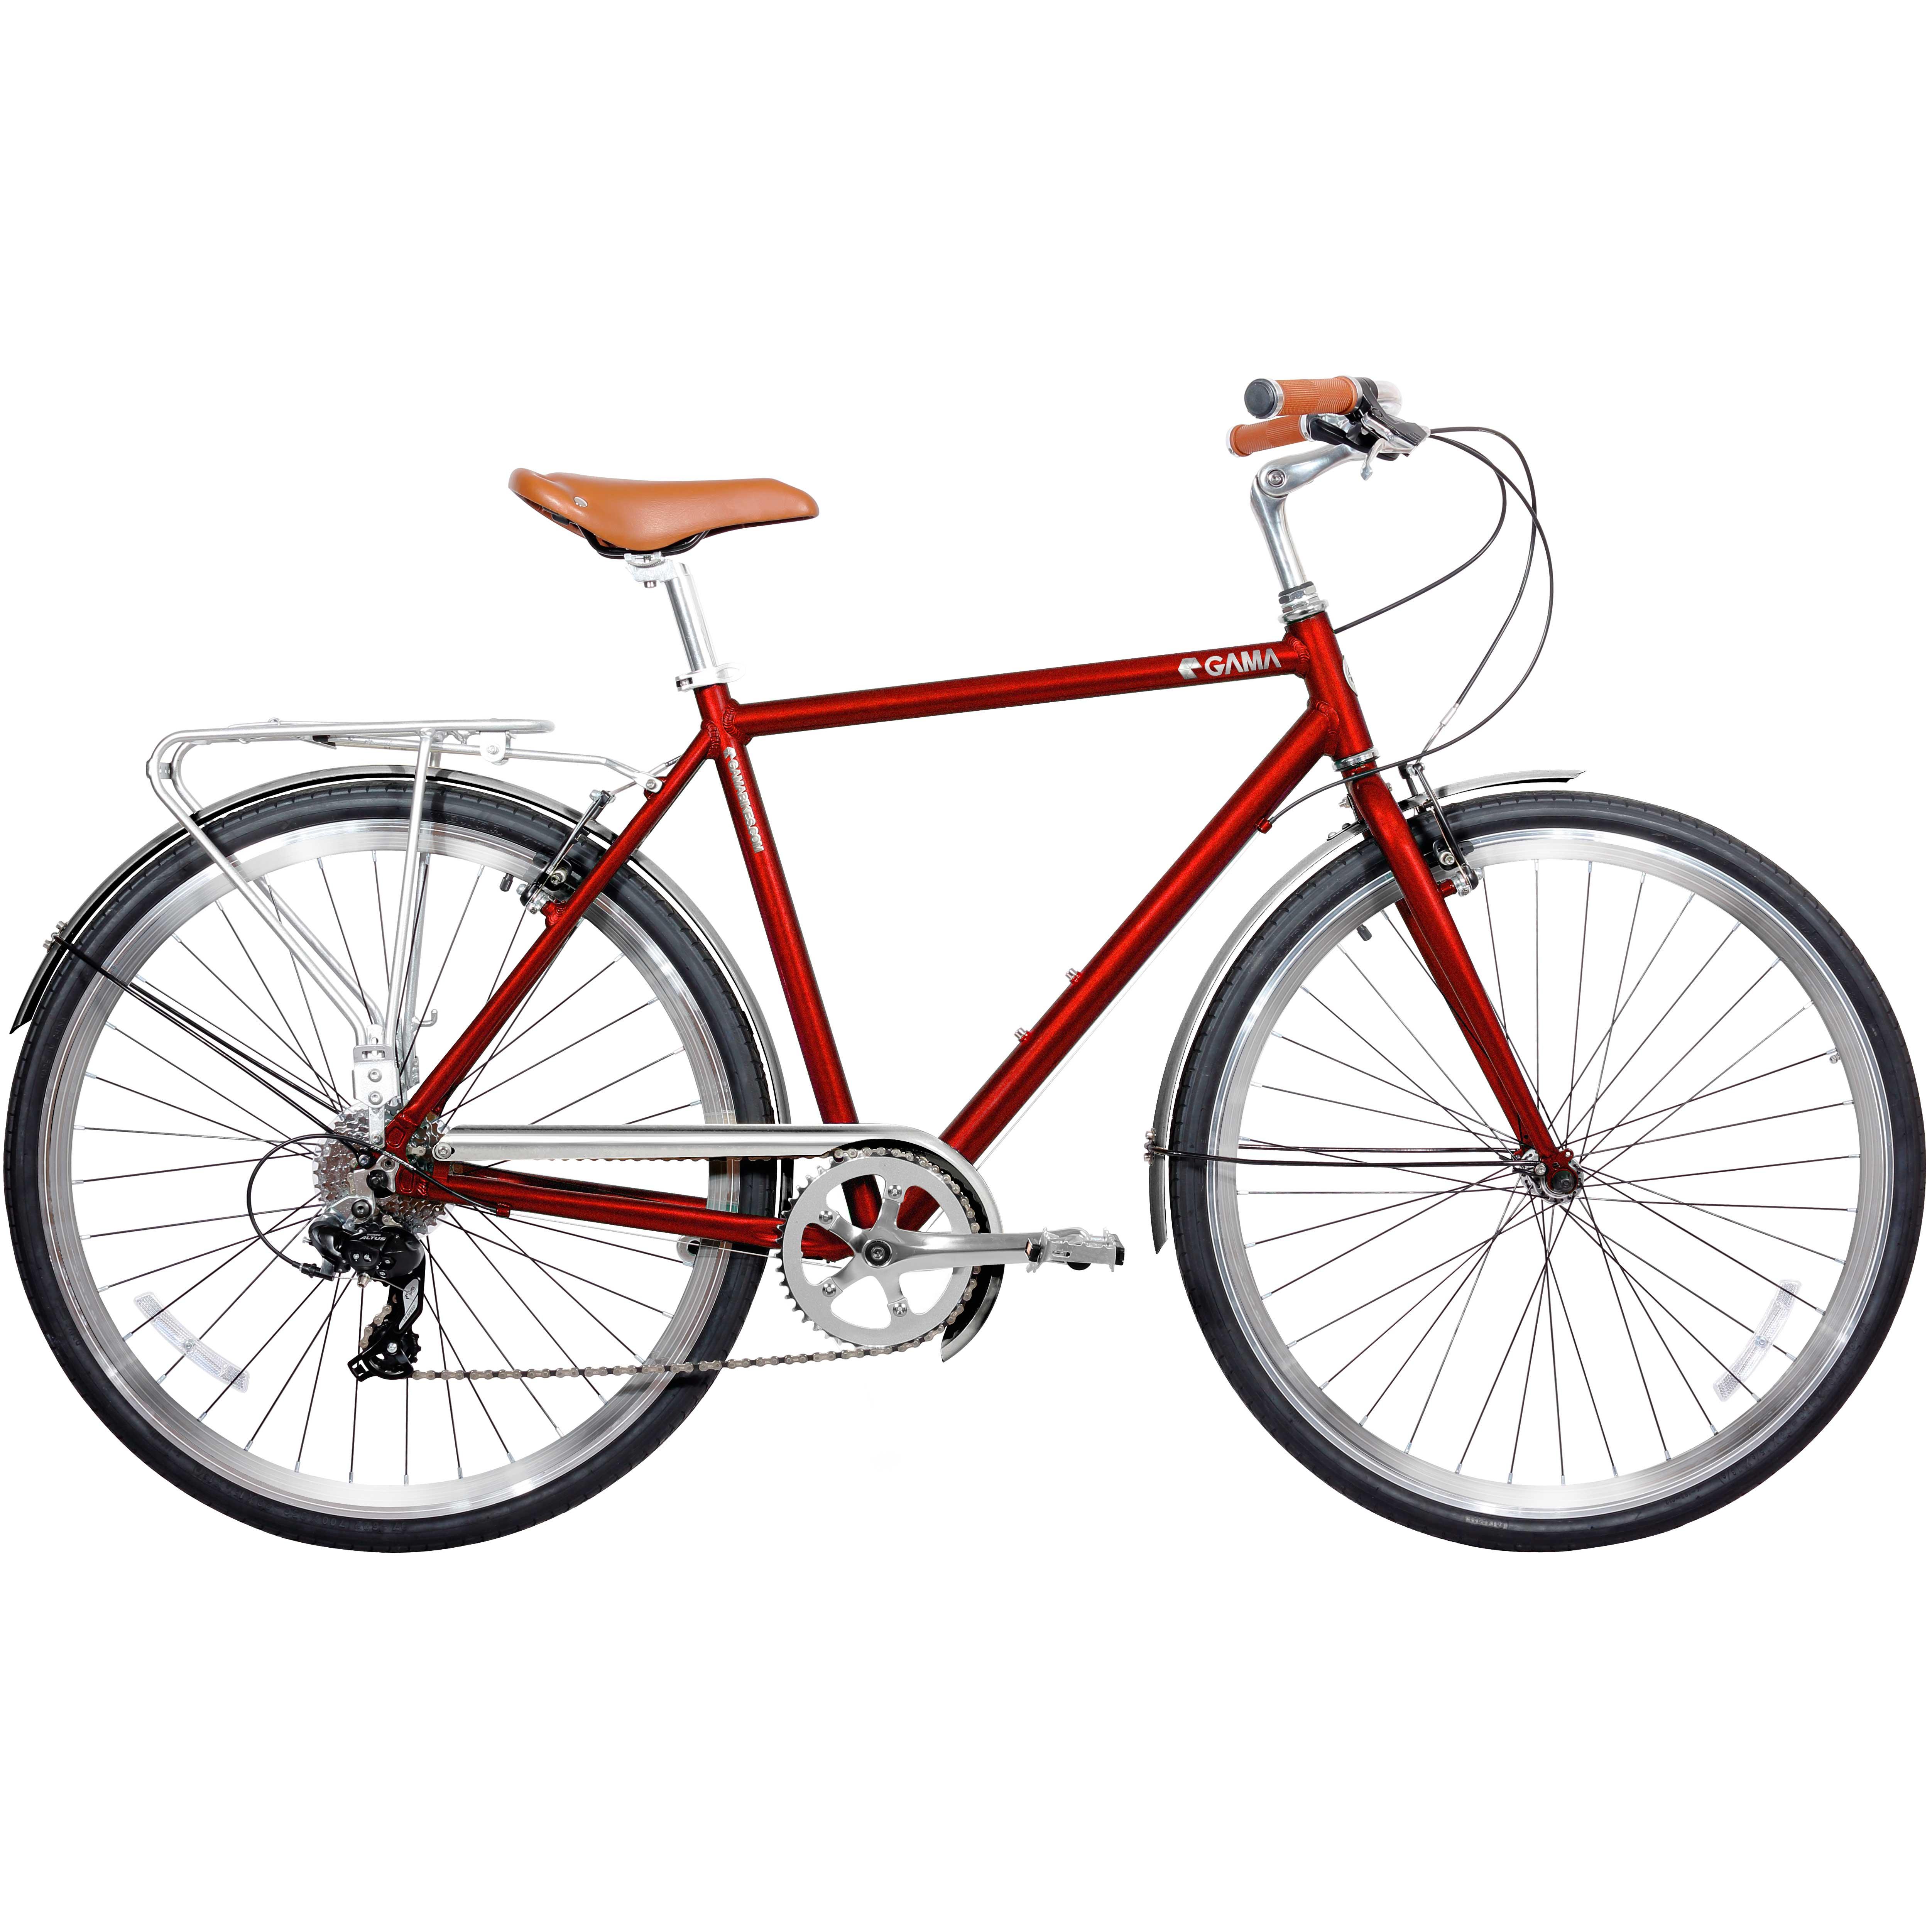 Bicicleta Gama 28 Metropole Men Talla 19 Burgundy 702038339274